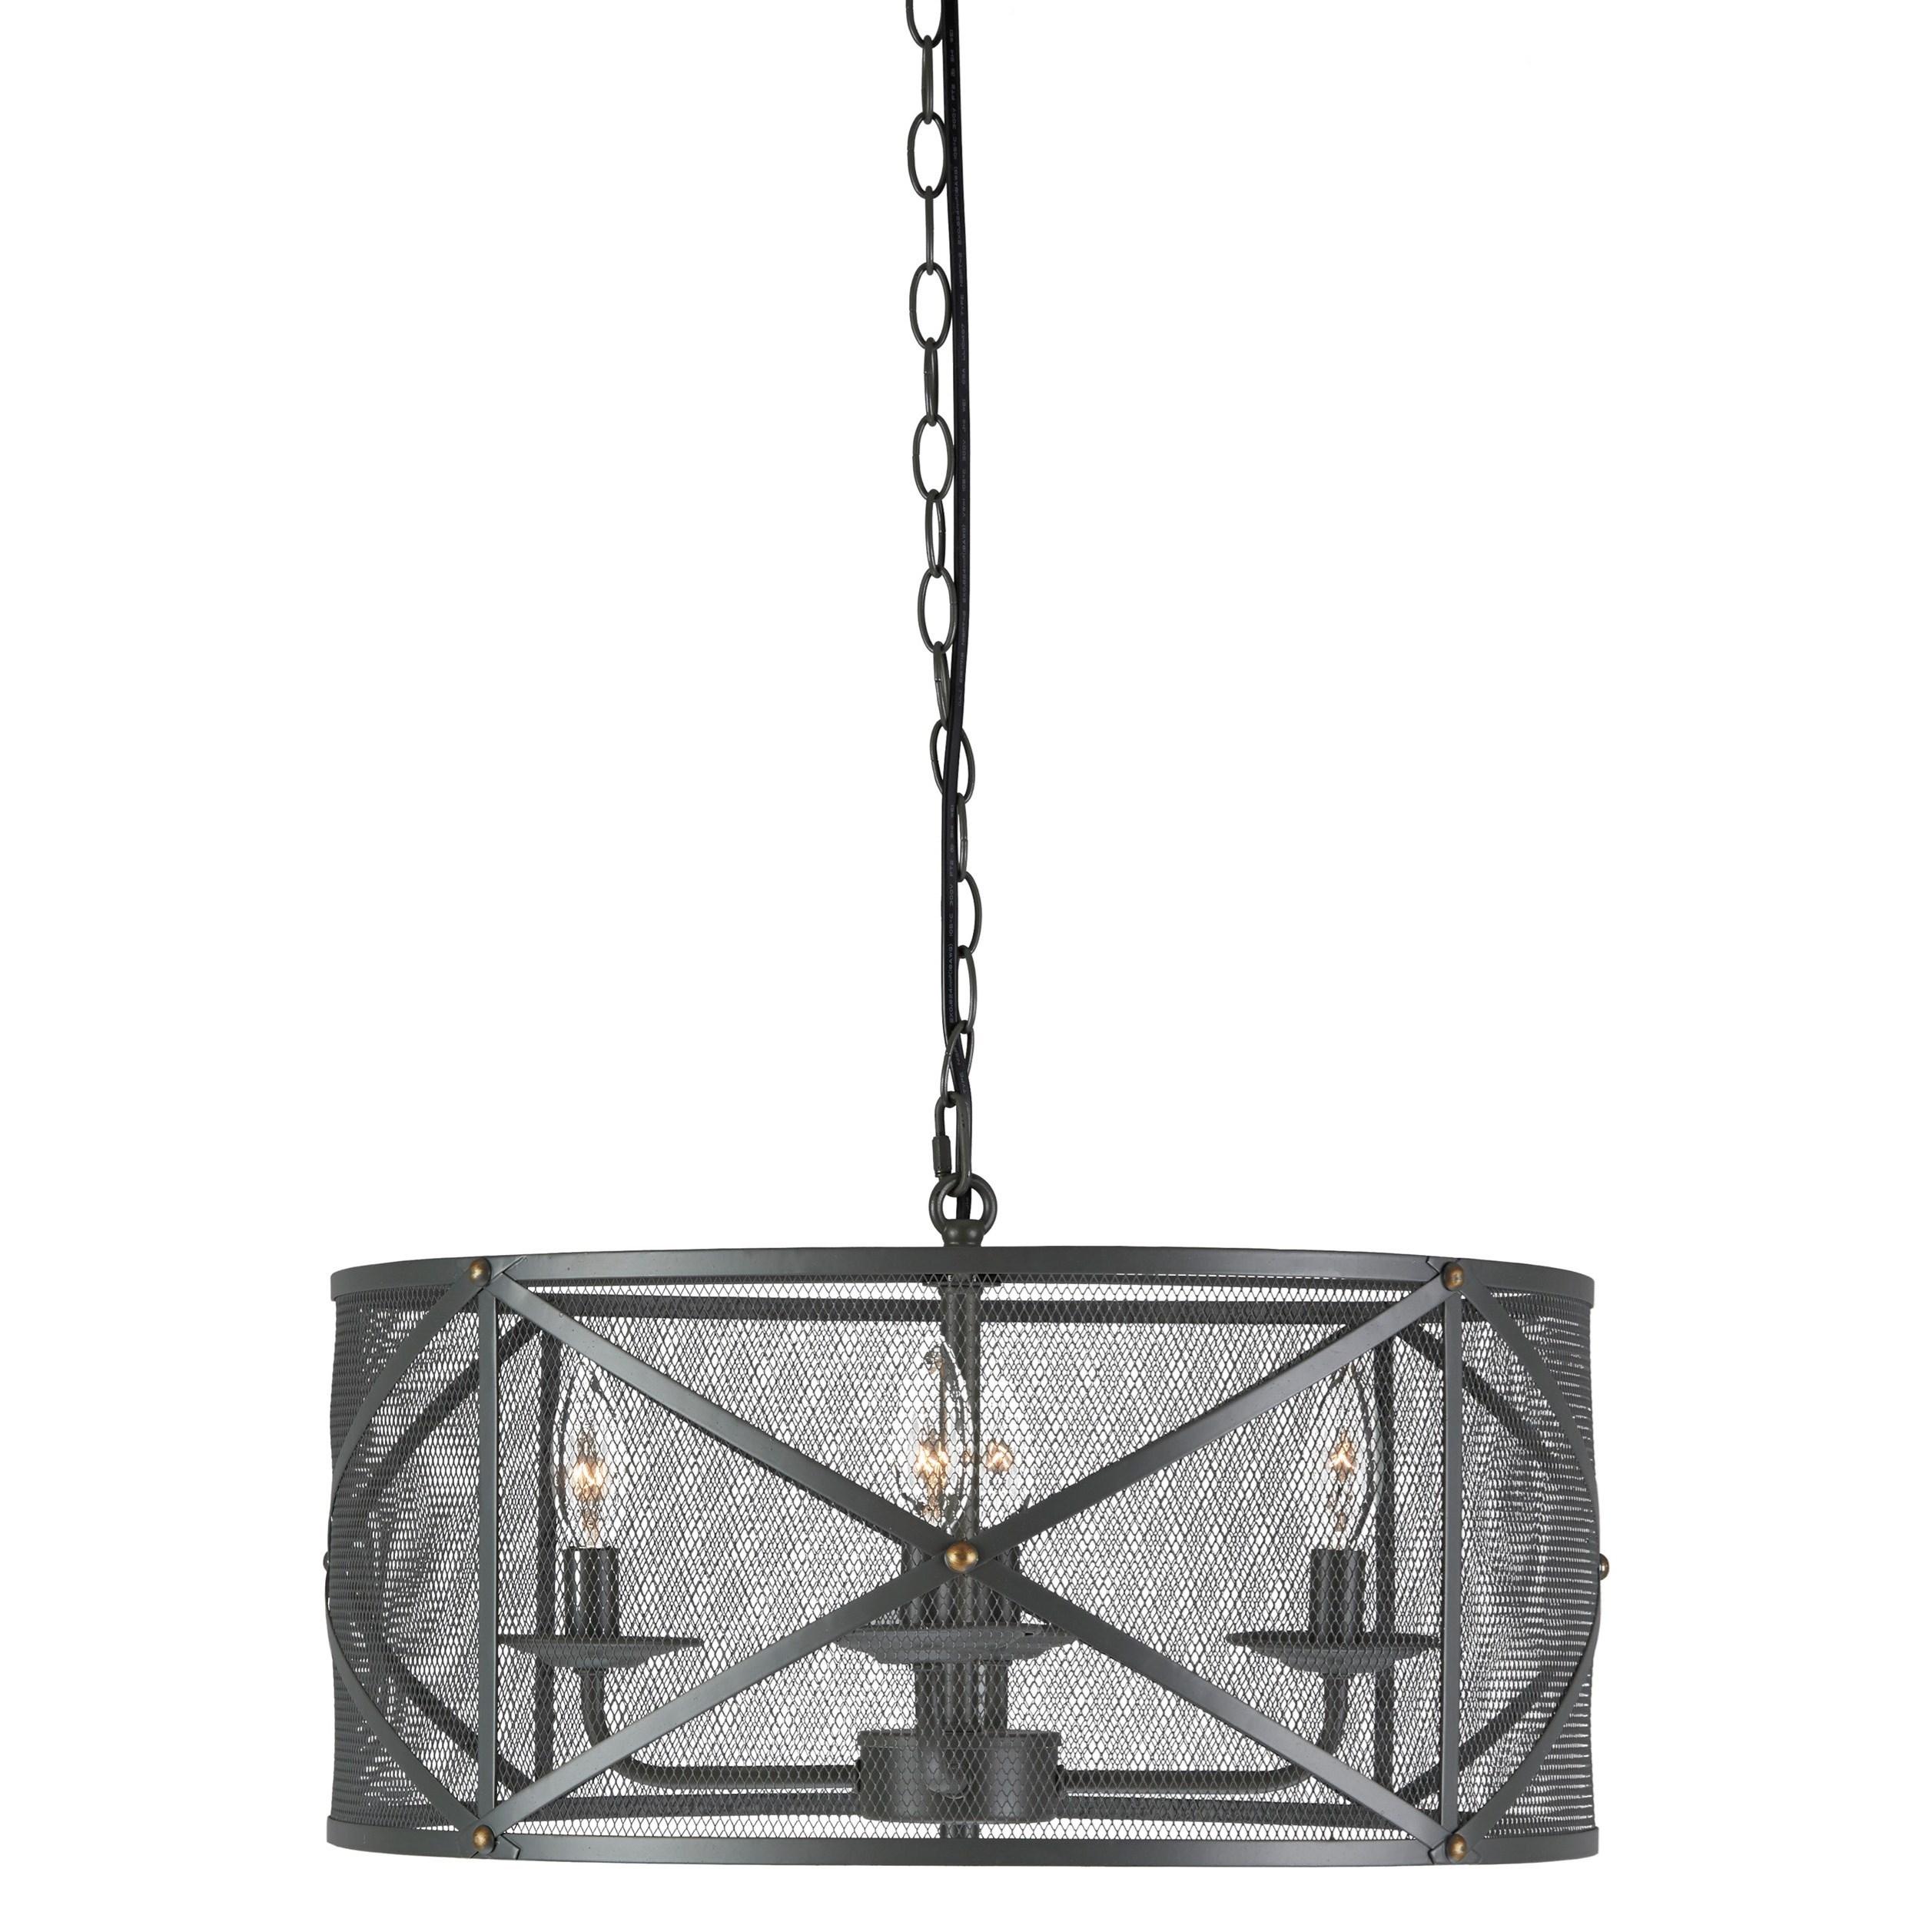 Signature Design by Ashley Pendant Lights Jovani Charcoal Metal Pendant Light - Item Number: L000358